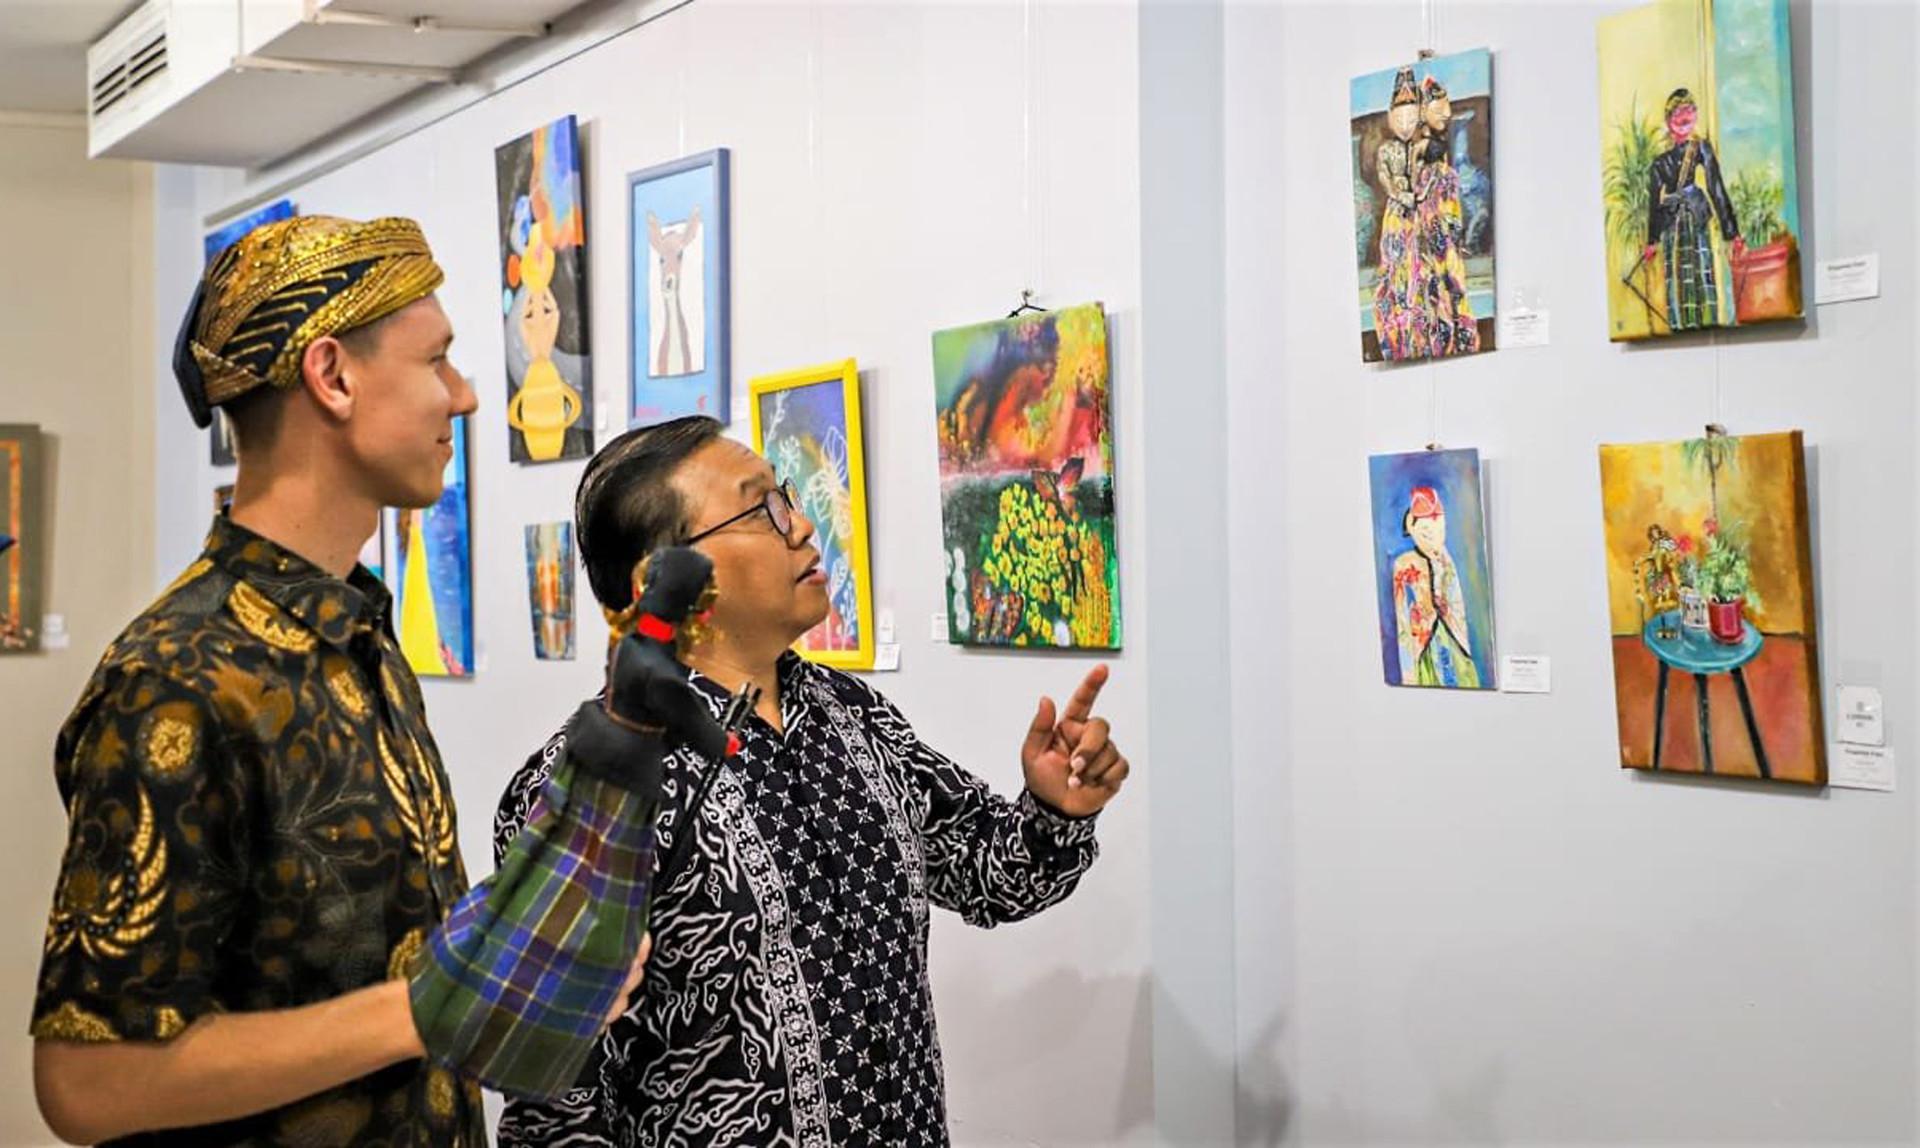 Vladimir mendampingi Wakil Duta Besar Indonesia untuk Rusia dan Belarusia Azis Nurwahyudi melihat karyanya.